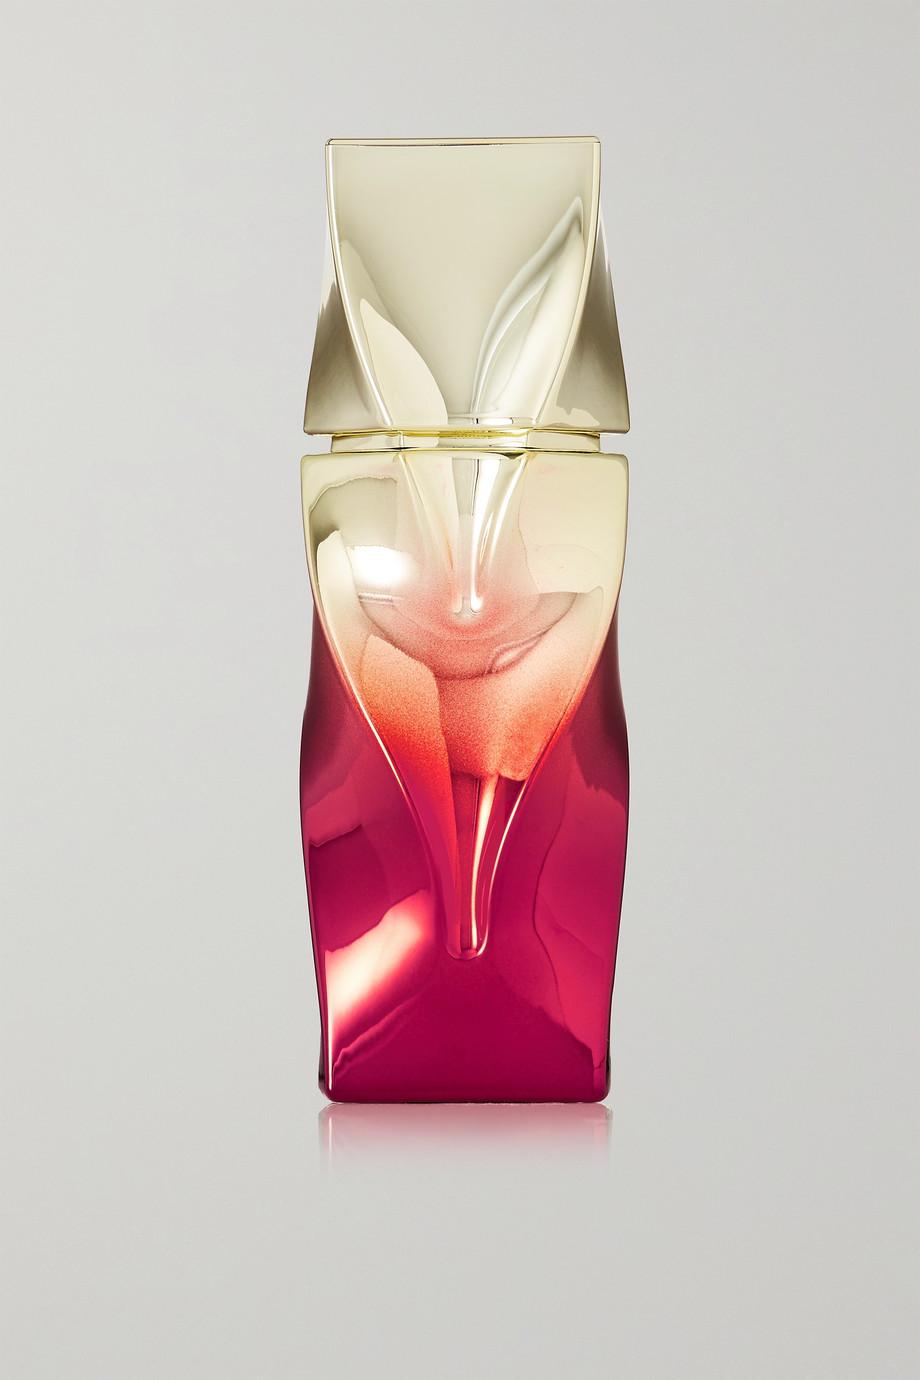 Christian Louboutin Beauty Tornade Blonde Perfume Oil, 30ml